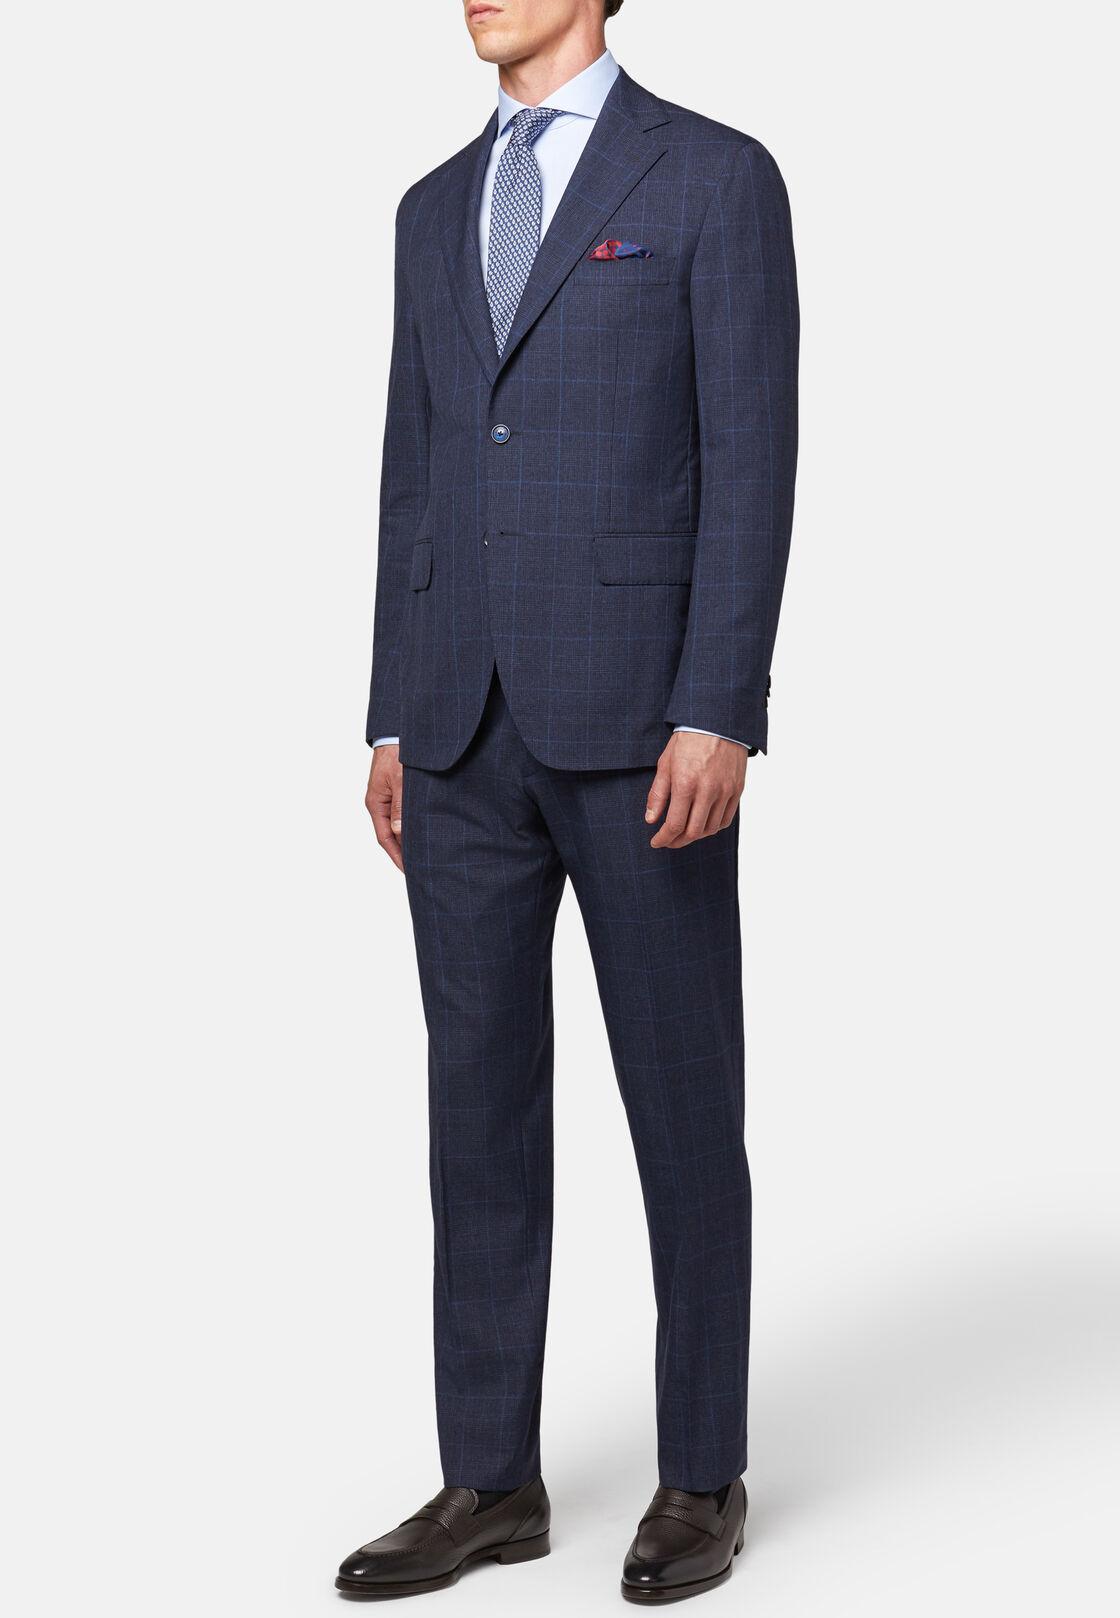 Blauer anzug mit prince of wales-karos aus wolle, Blau, hi-res